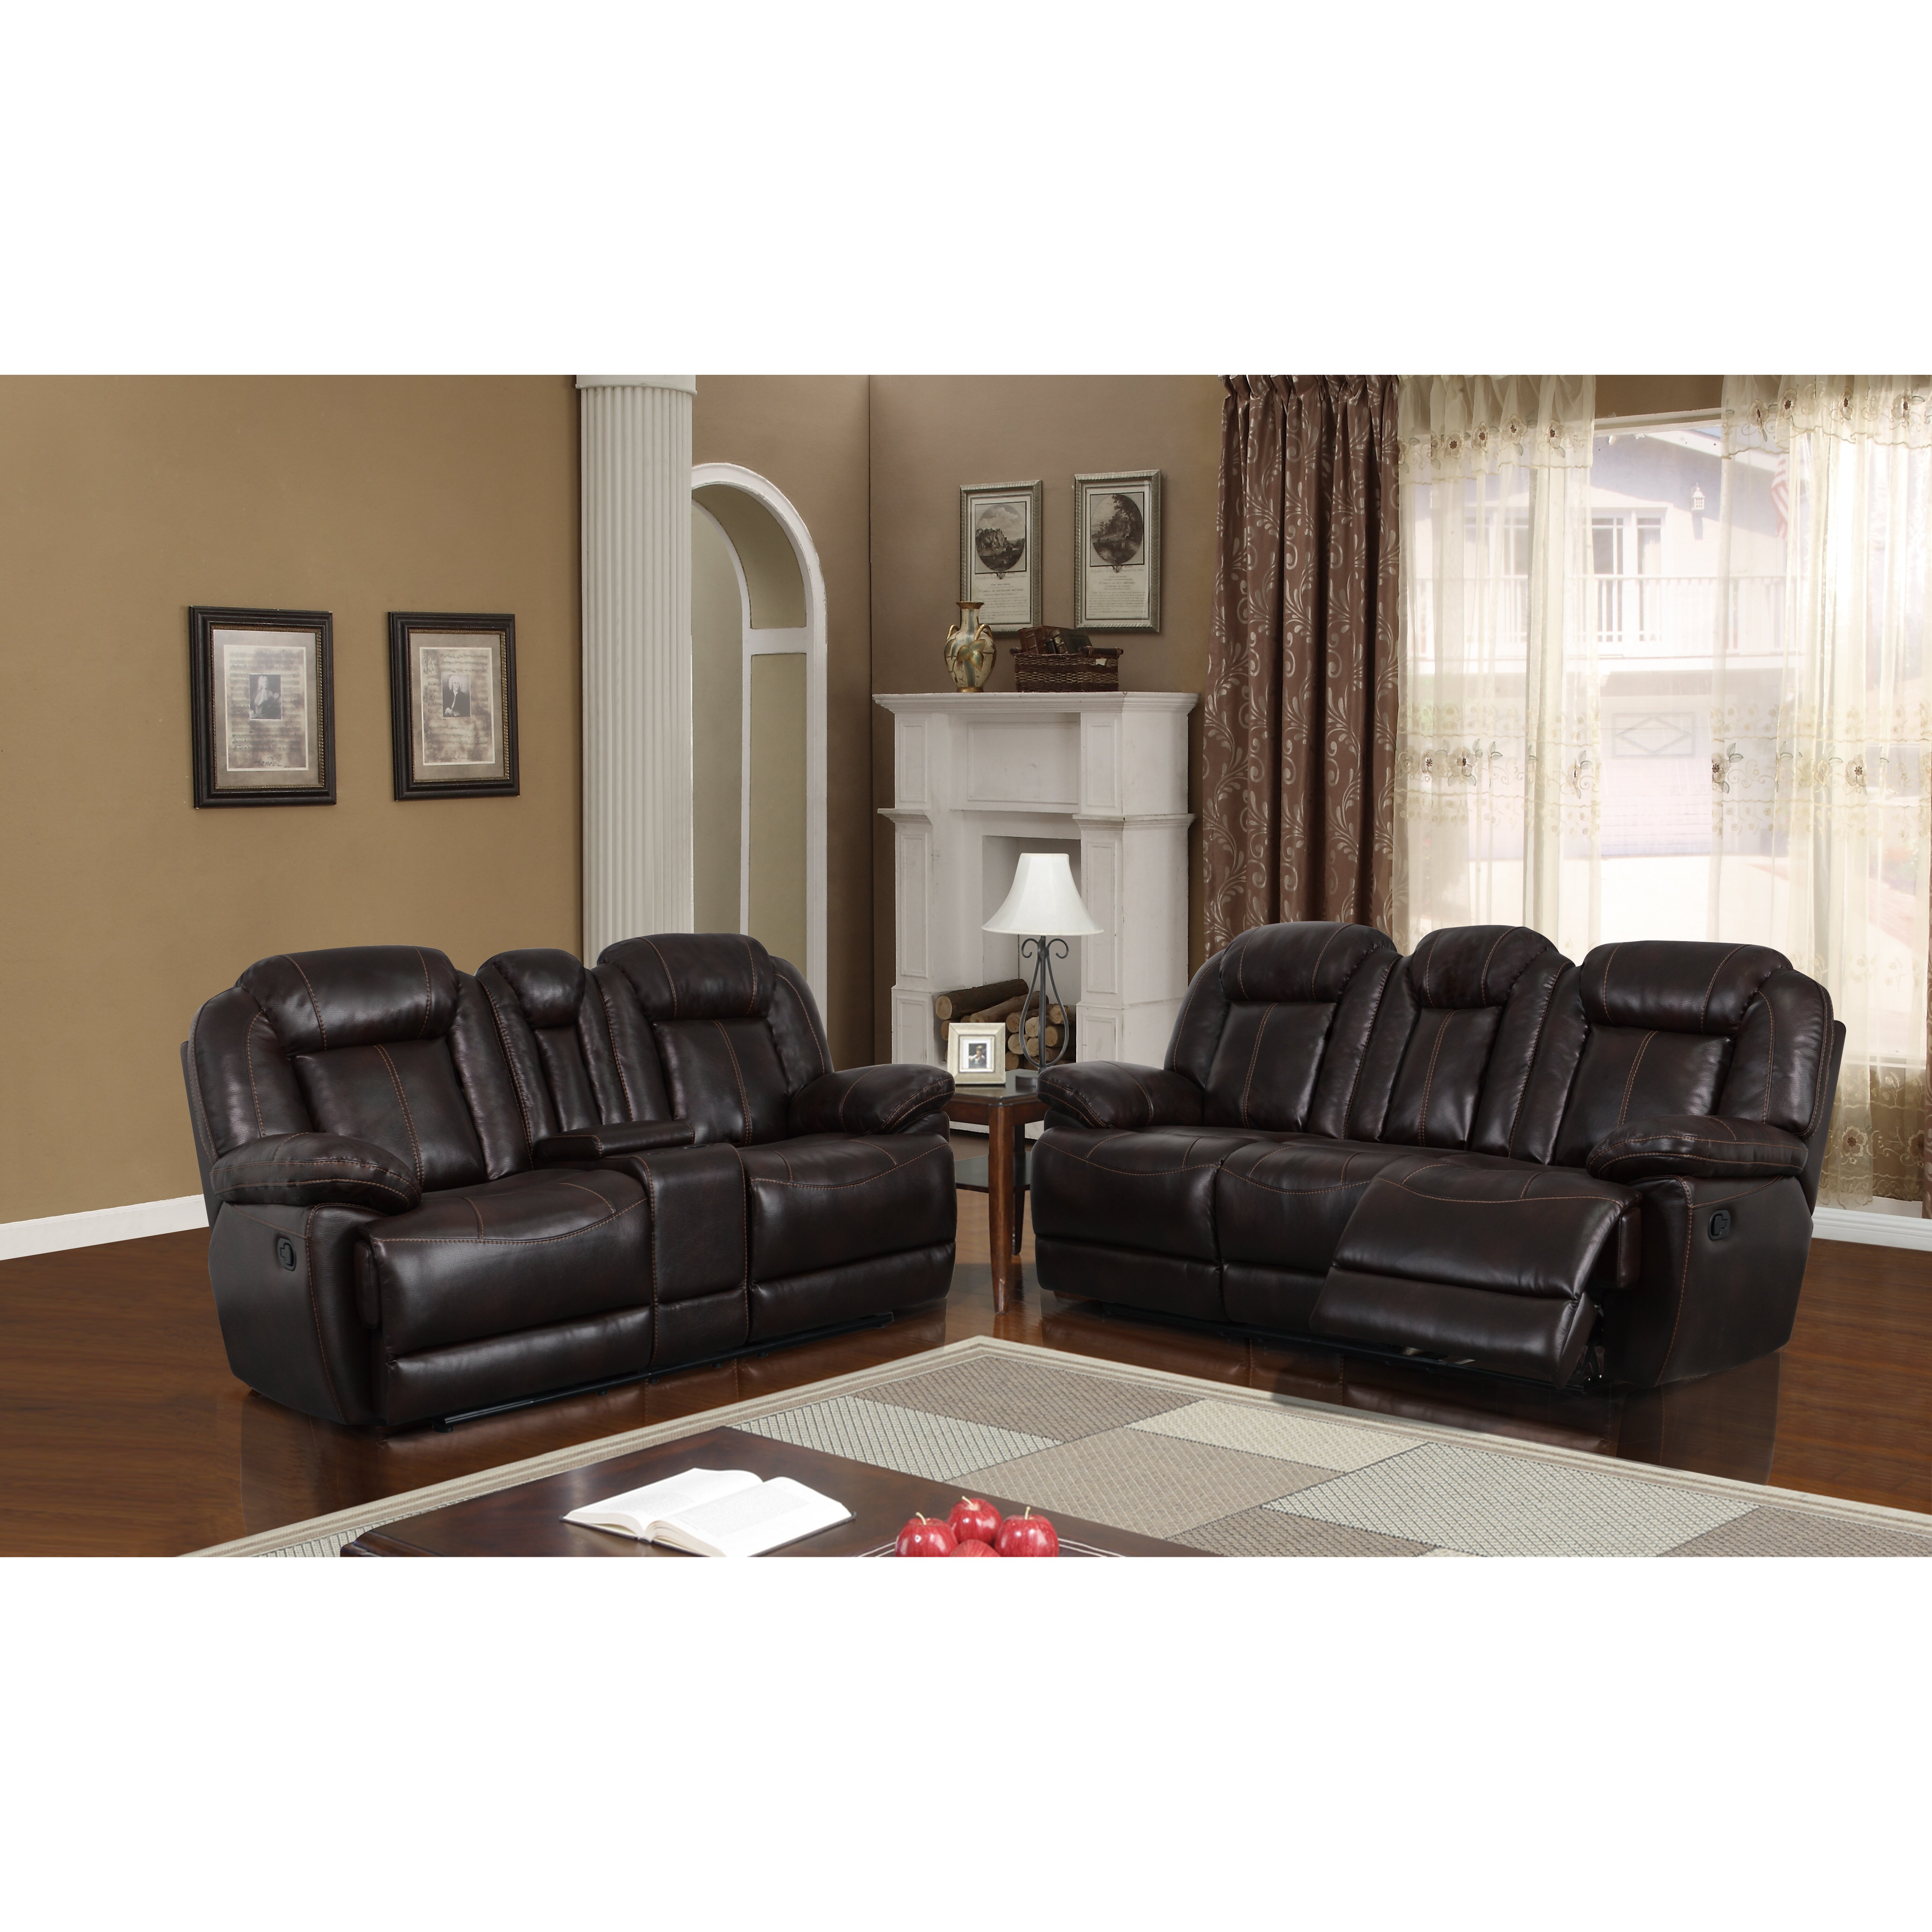 Global furniture usa console reclining loveseat wayfair for Furniture usa